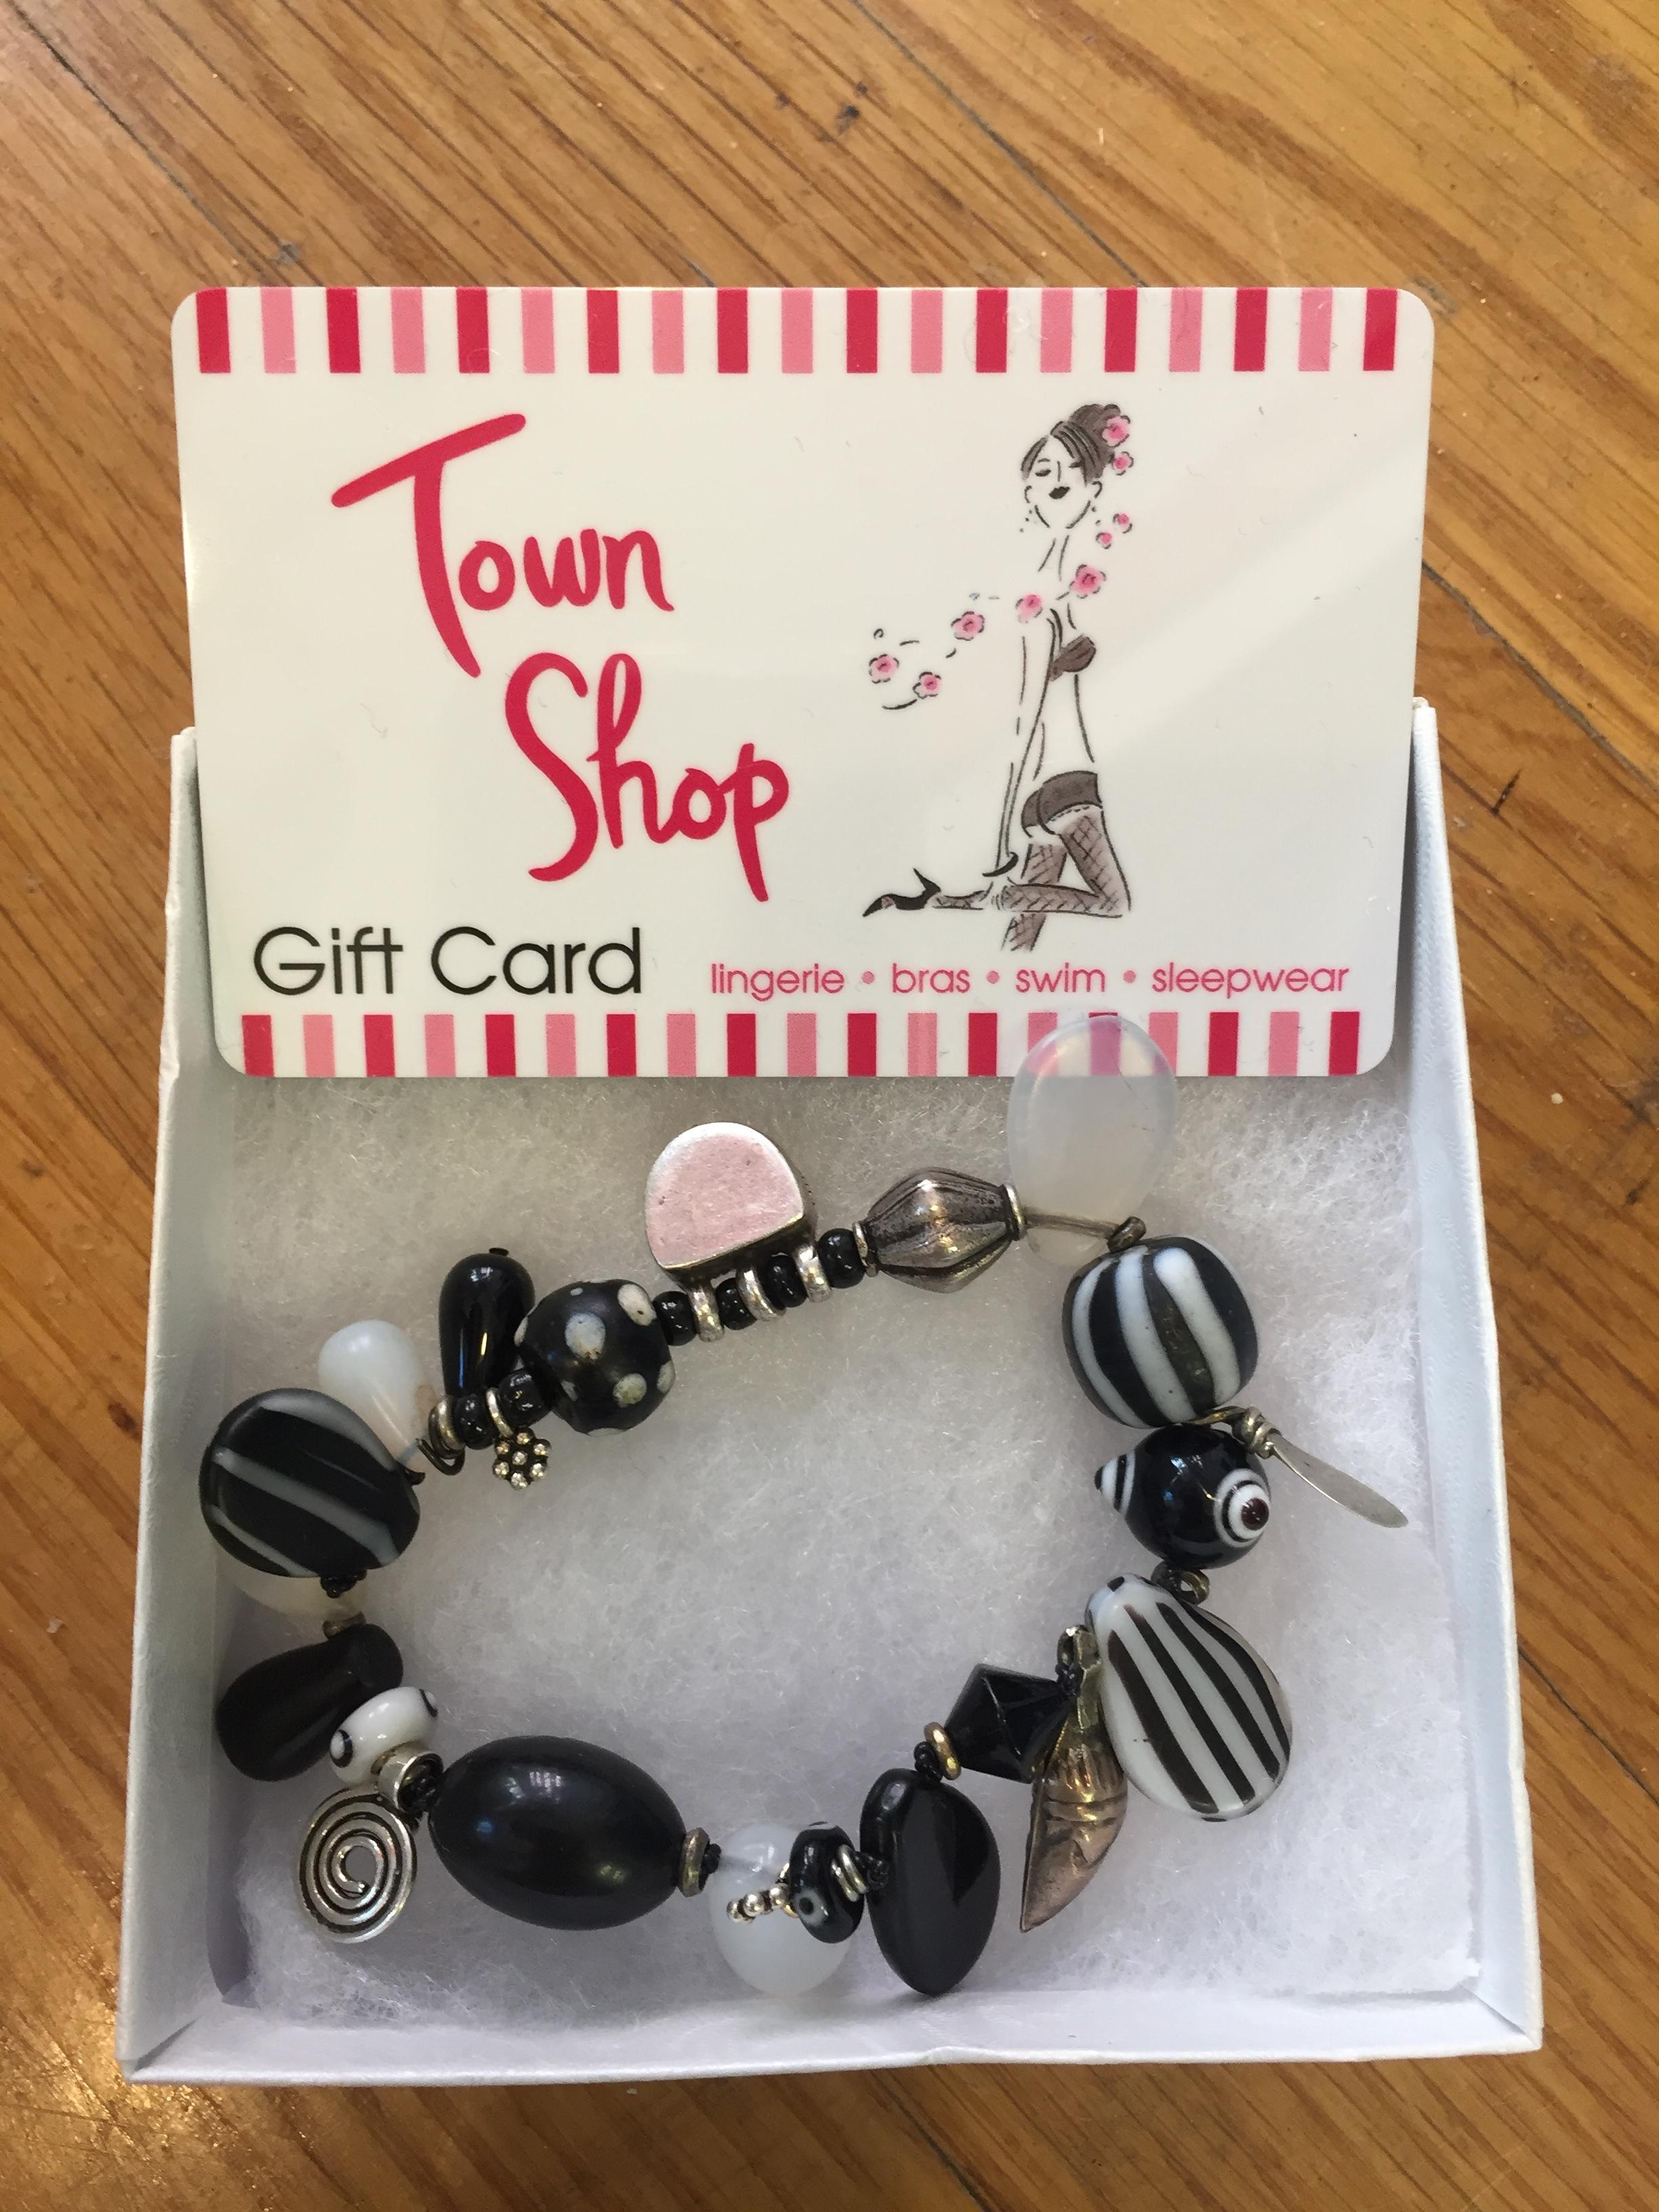 Town Shop Gift Certificate  Value: $50.-  Janet Henry Bracelet  Value: $50.-  Minimum Bid $30, increments of $10.-